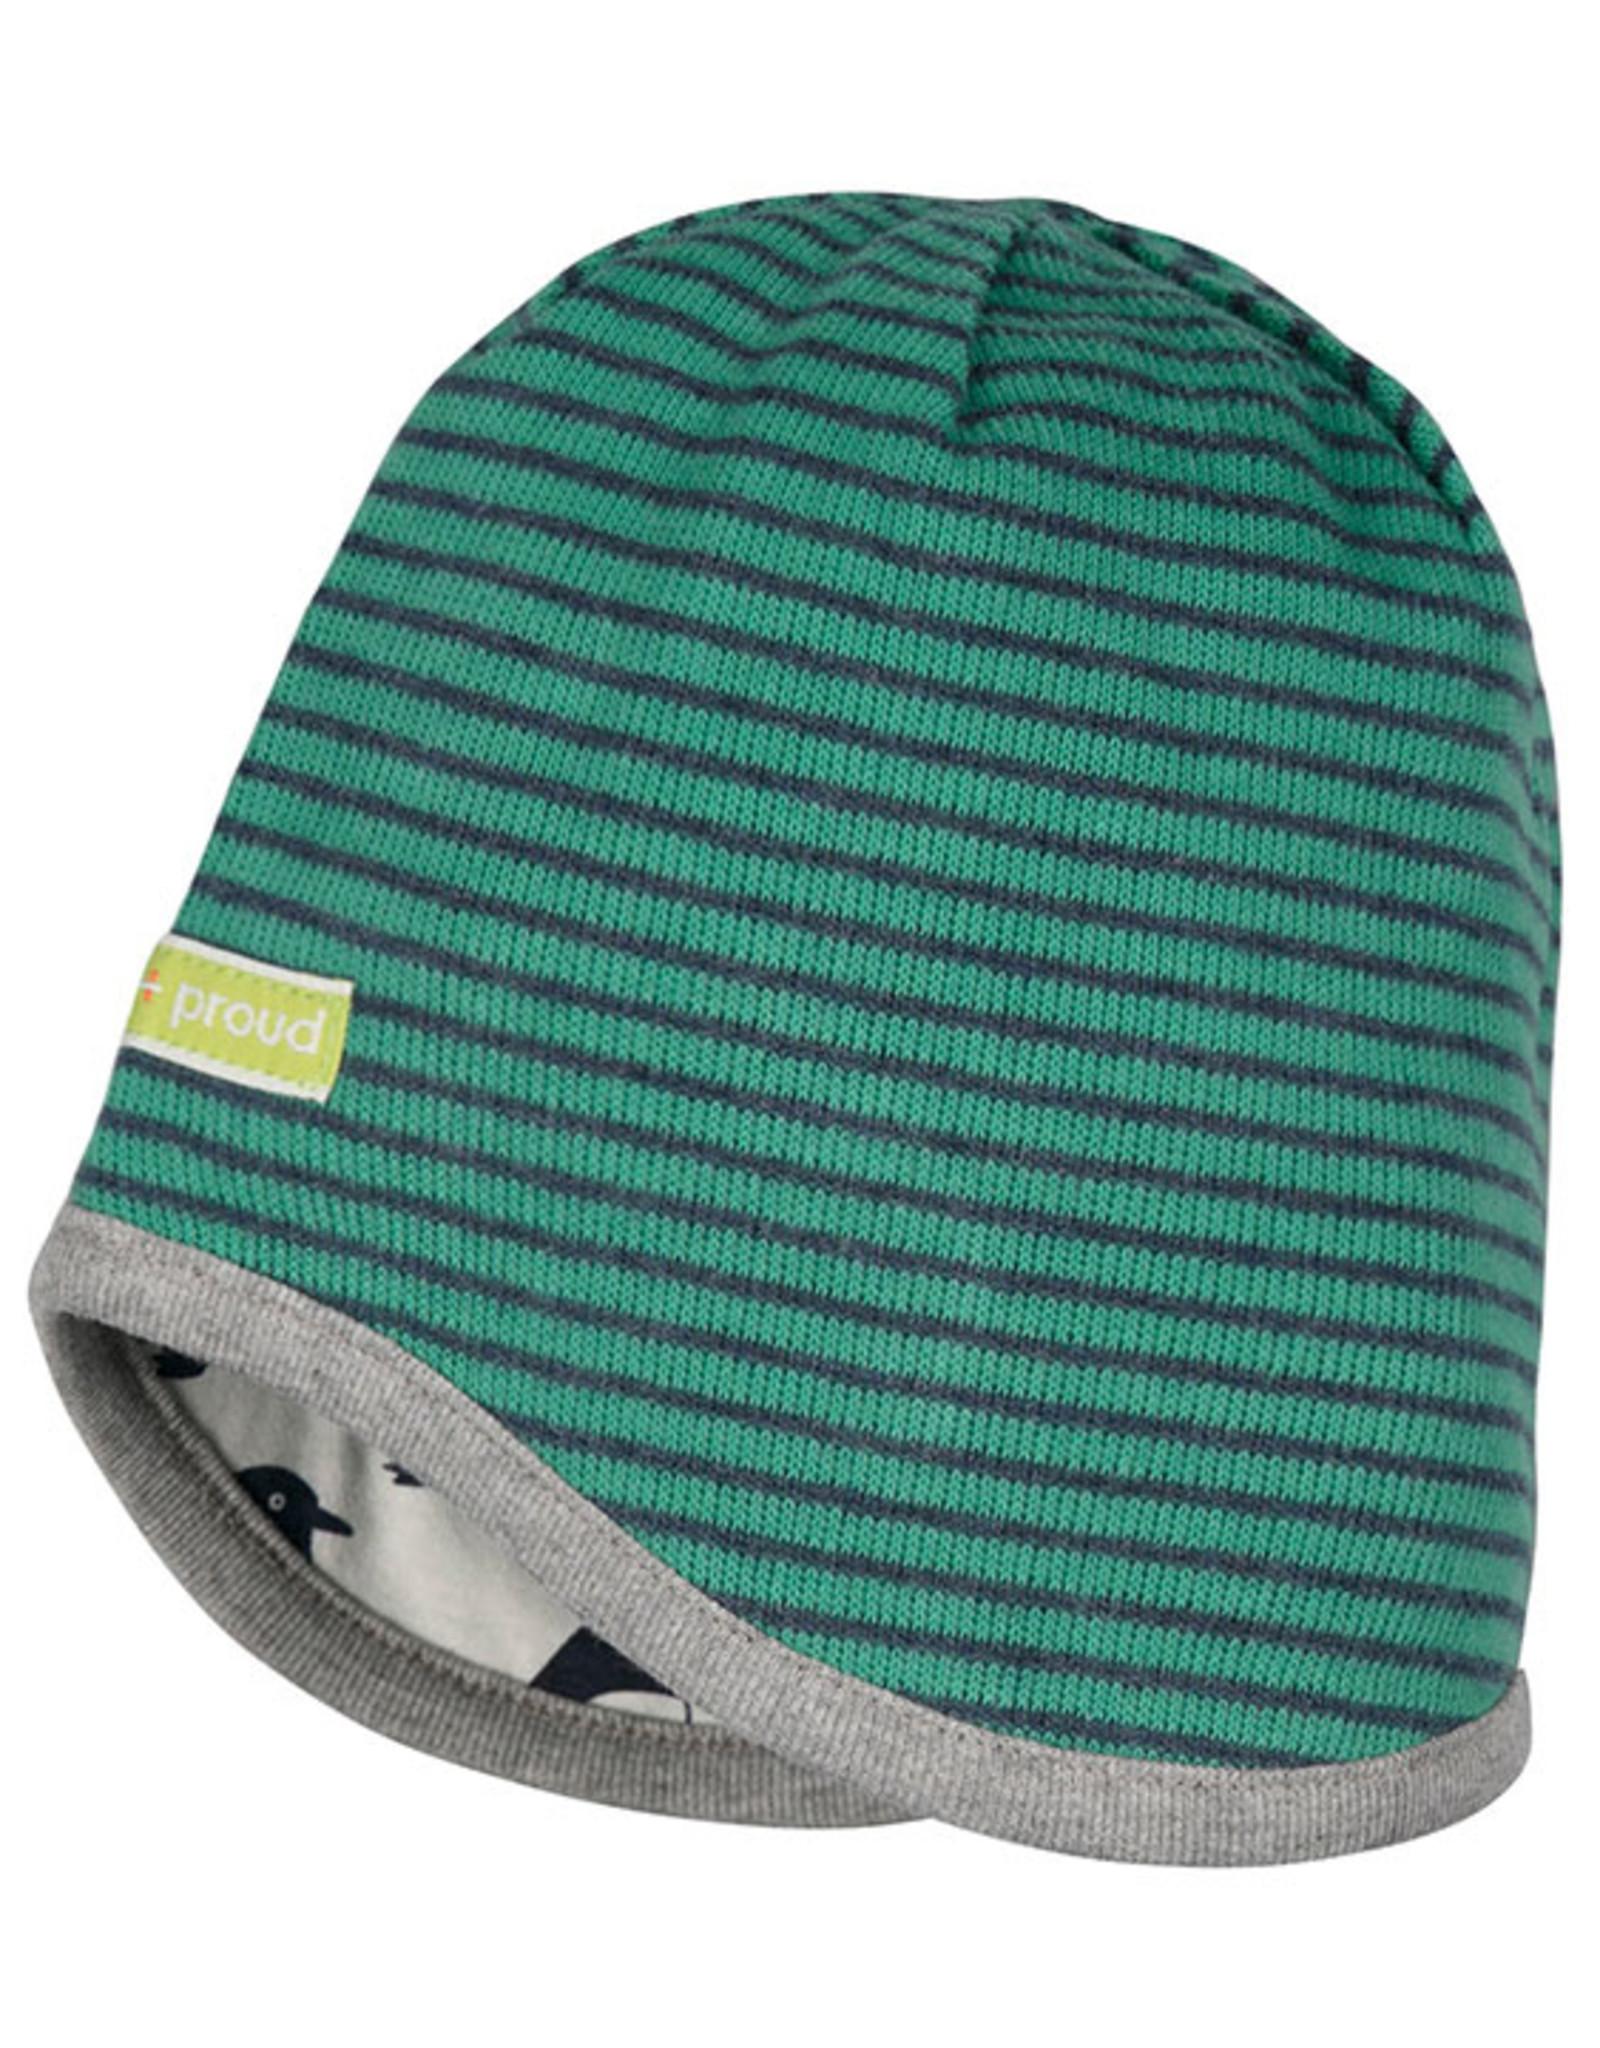 loud+proud Children's hat - green with penguins